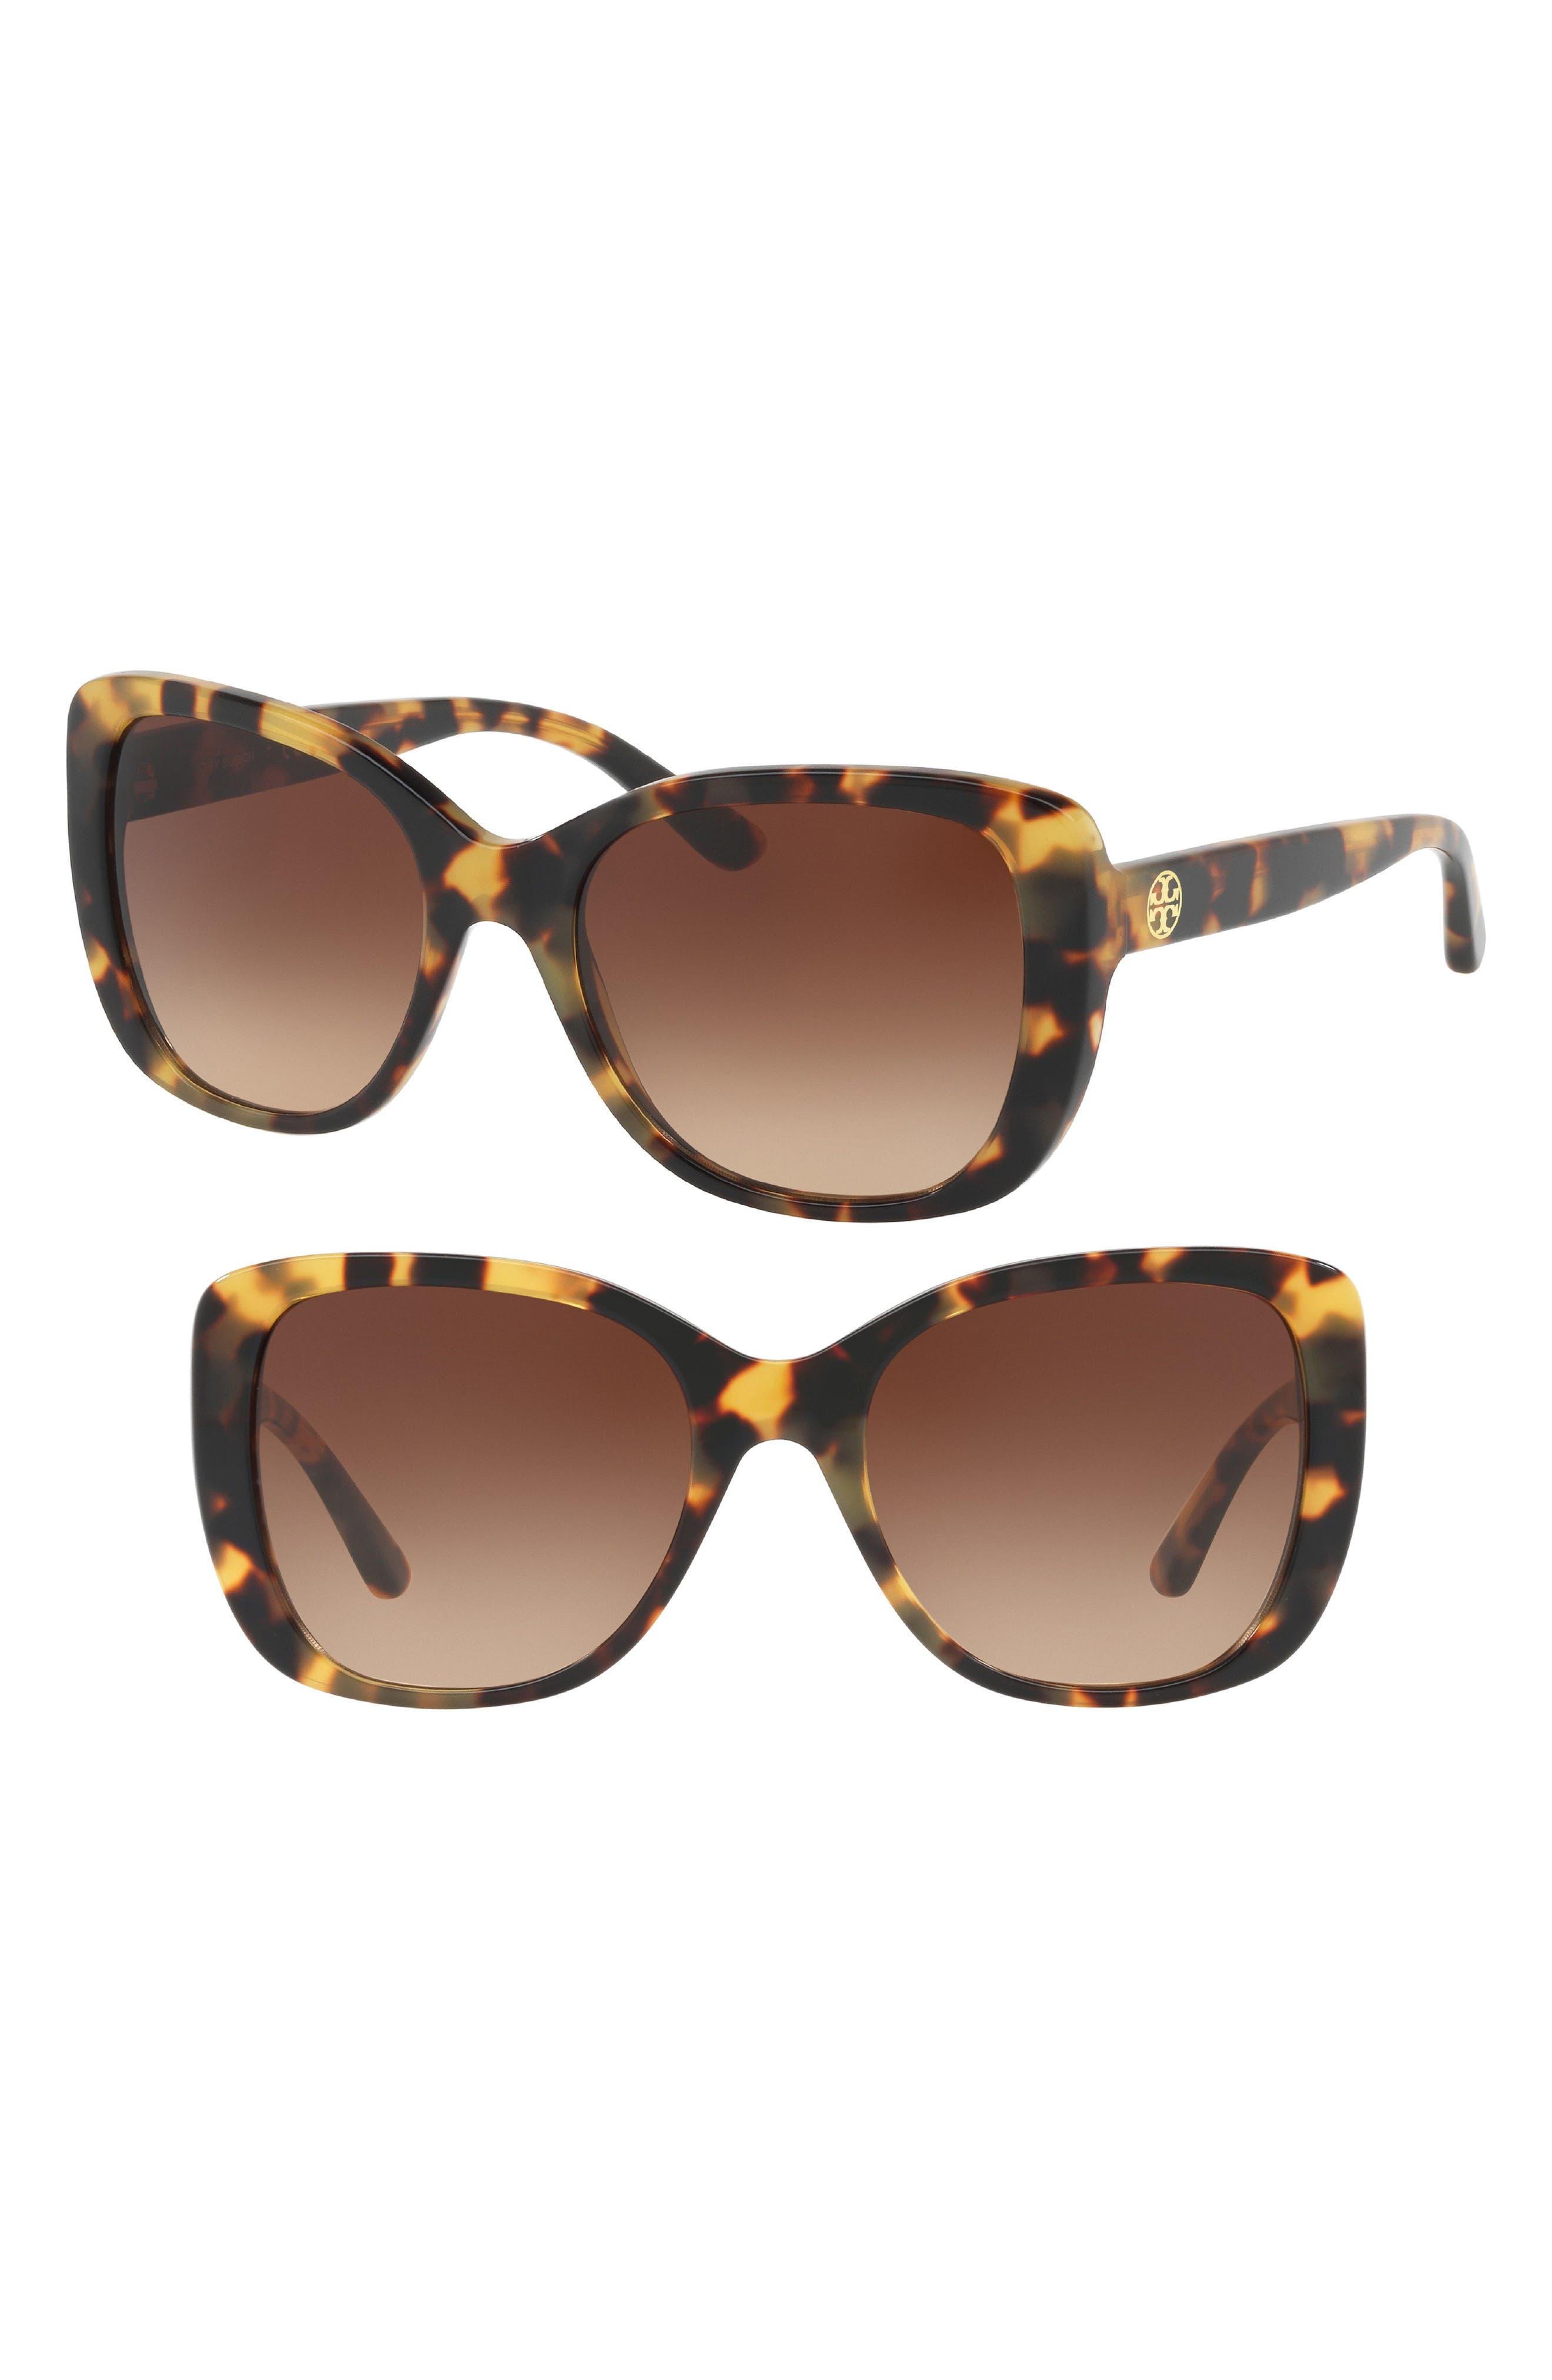 53mm Gradient Rectangle Sunglasses,                             Main thumbnail 1, color,                             211